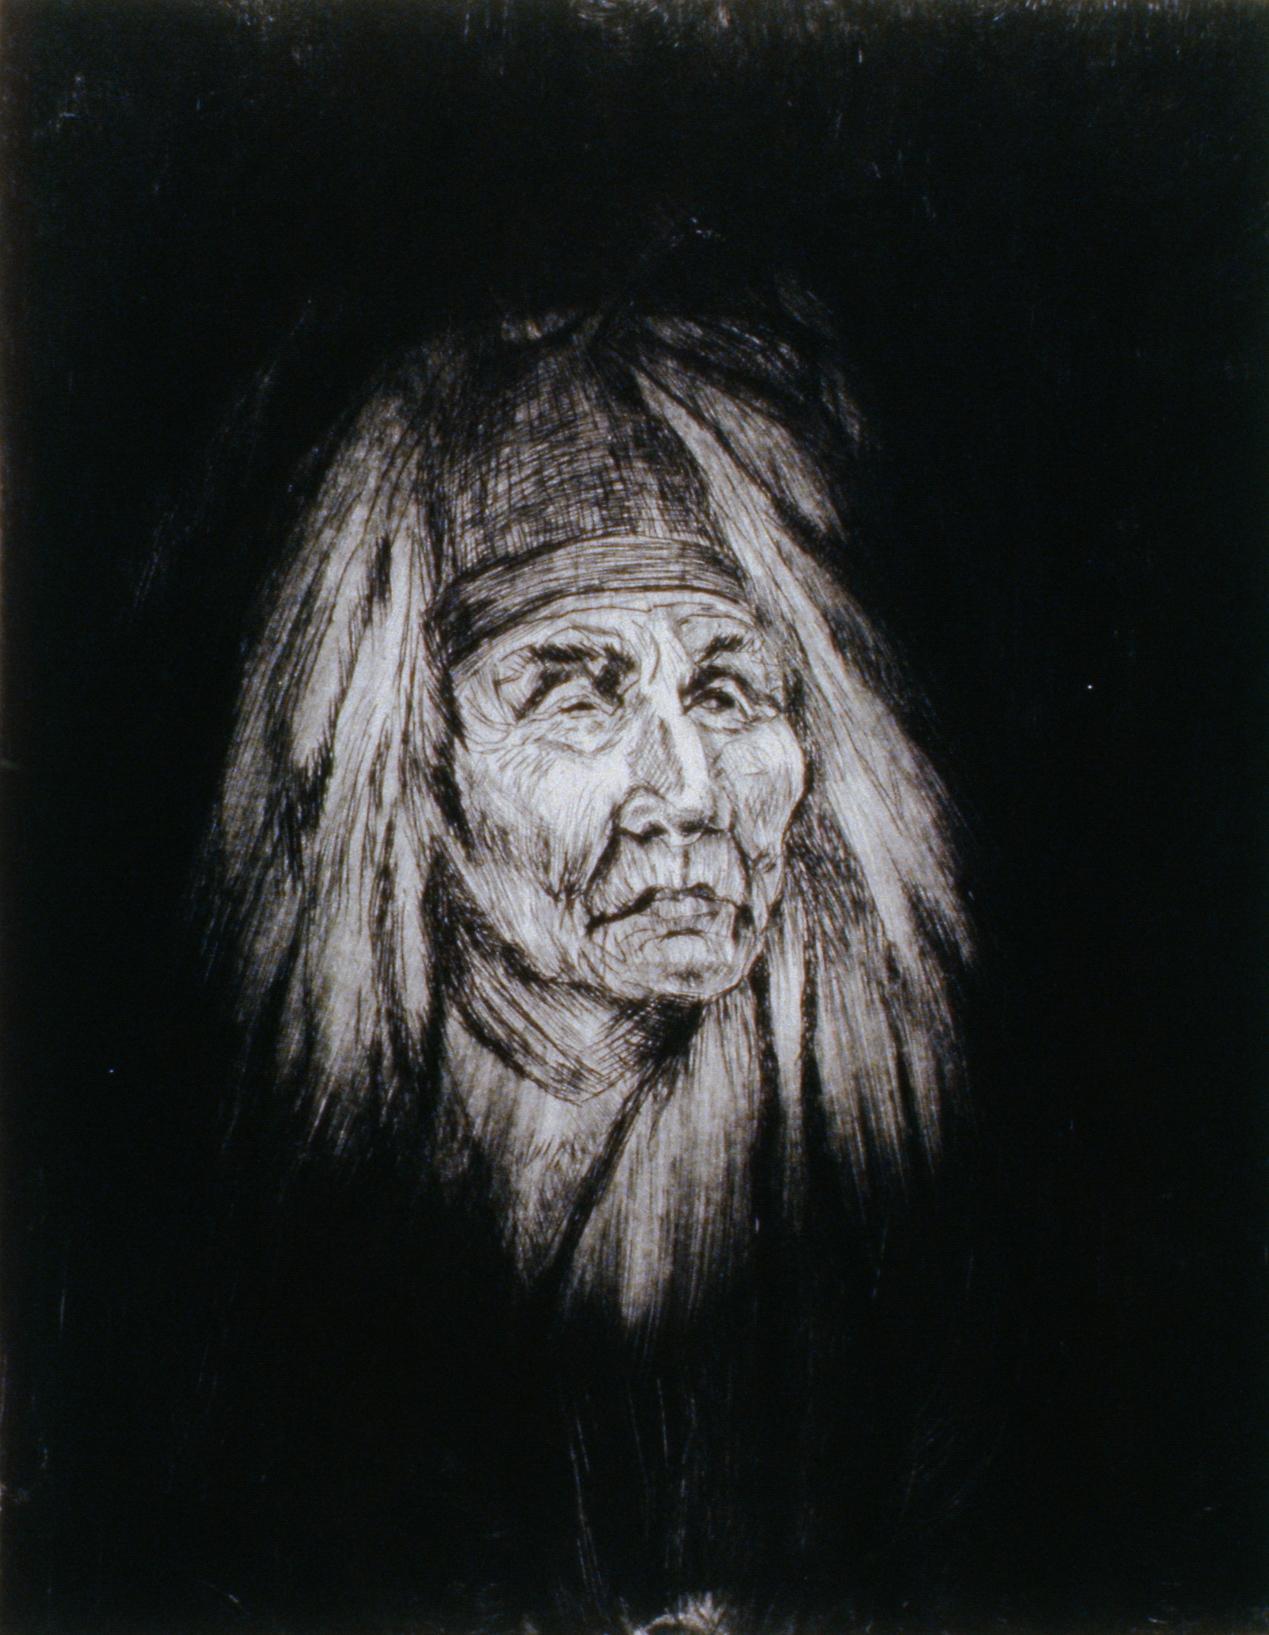 Shaman , 1980, Minn Sjølseth, artist proof, 25 x 20 cm, 1996.02.09